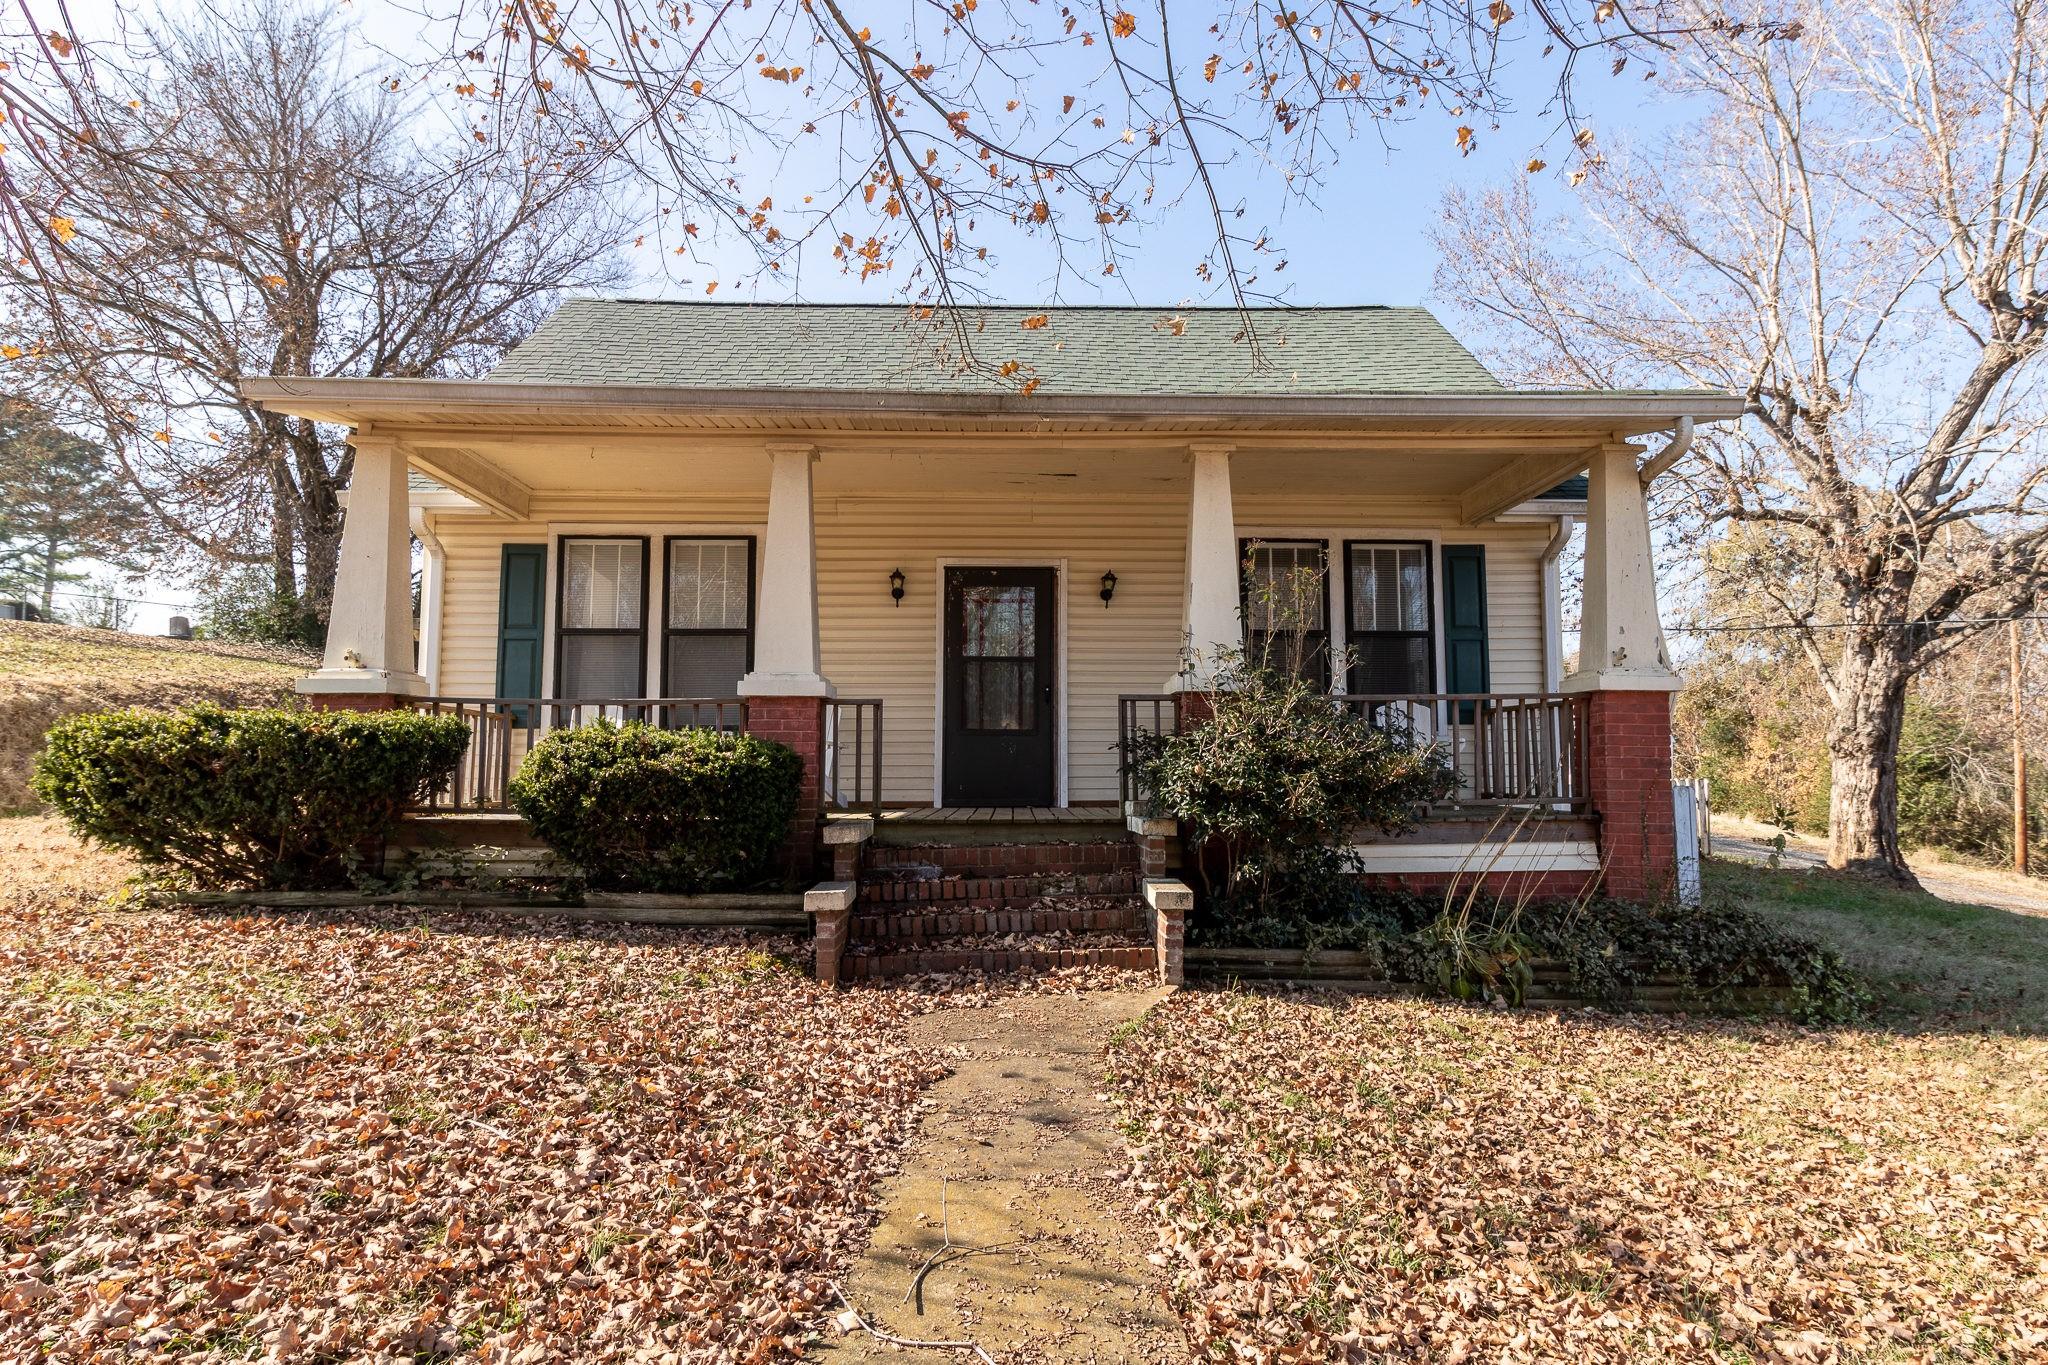 302 Main St, Cumberland City, TN 37050 - Cumberland City, TN real estate listing